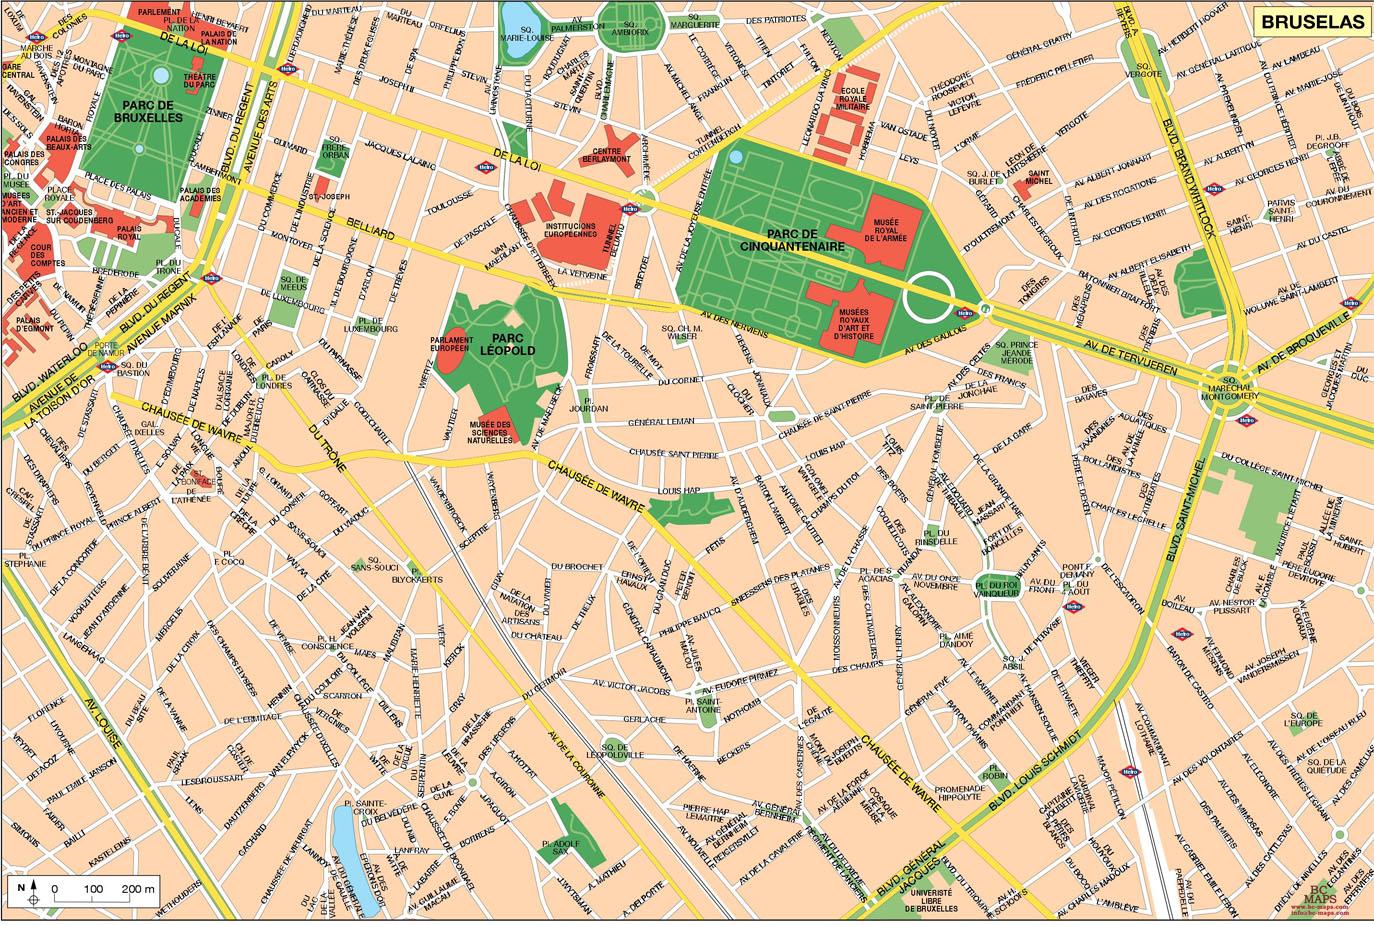 Bruselas Brussels Bruxelles Mapa Vectorial Editable Eps Illustrator